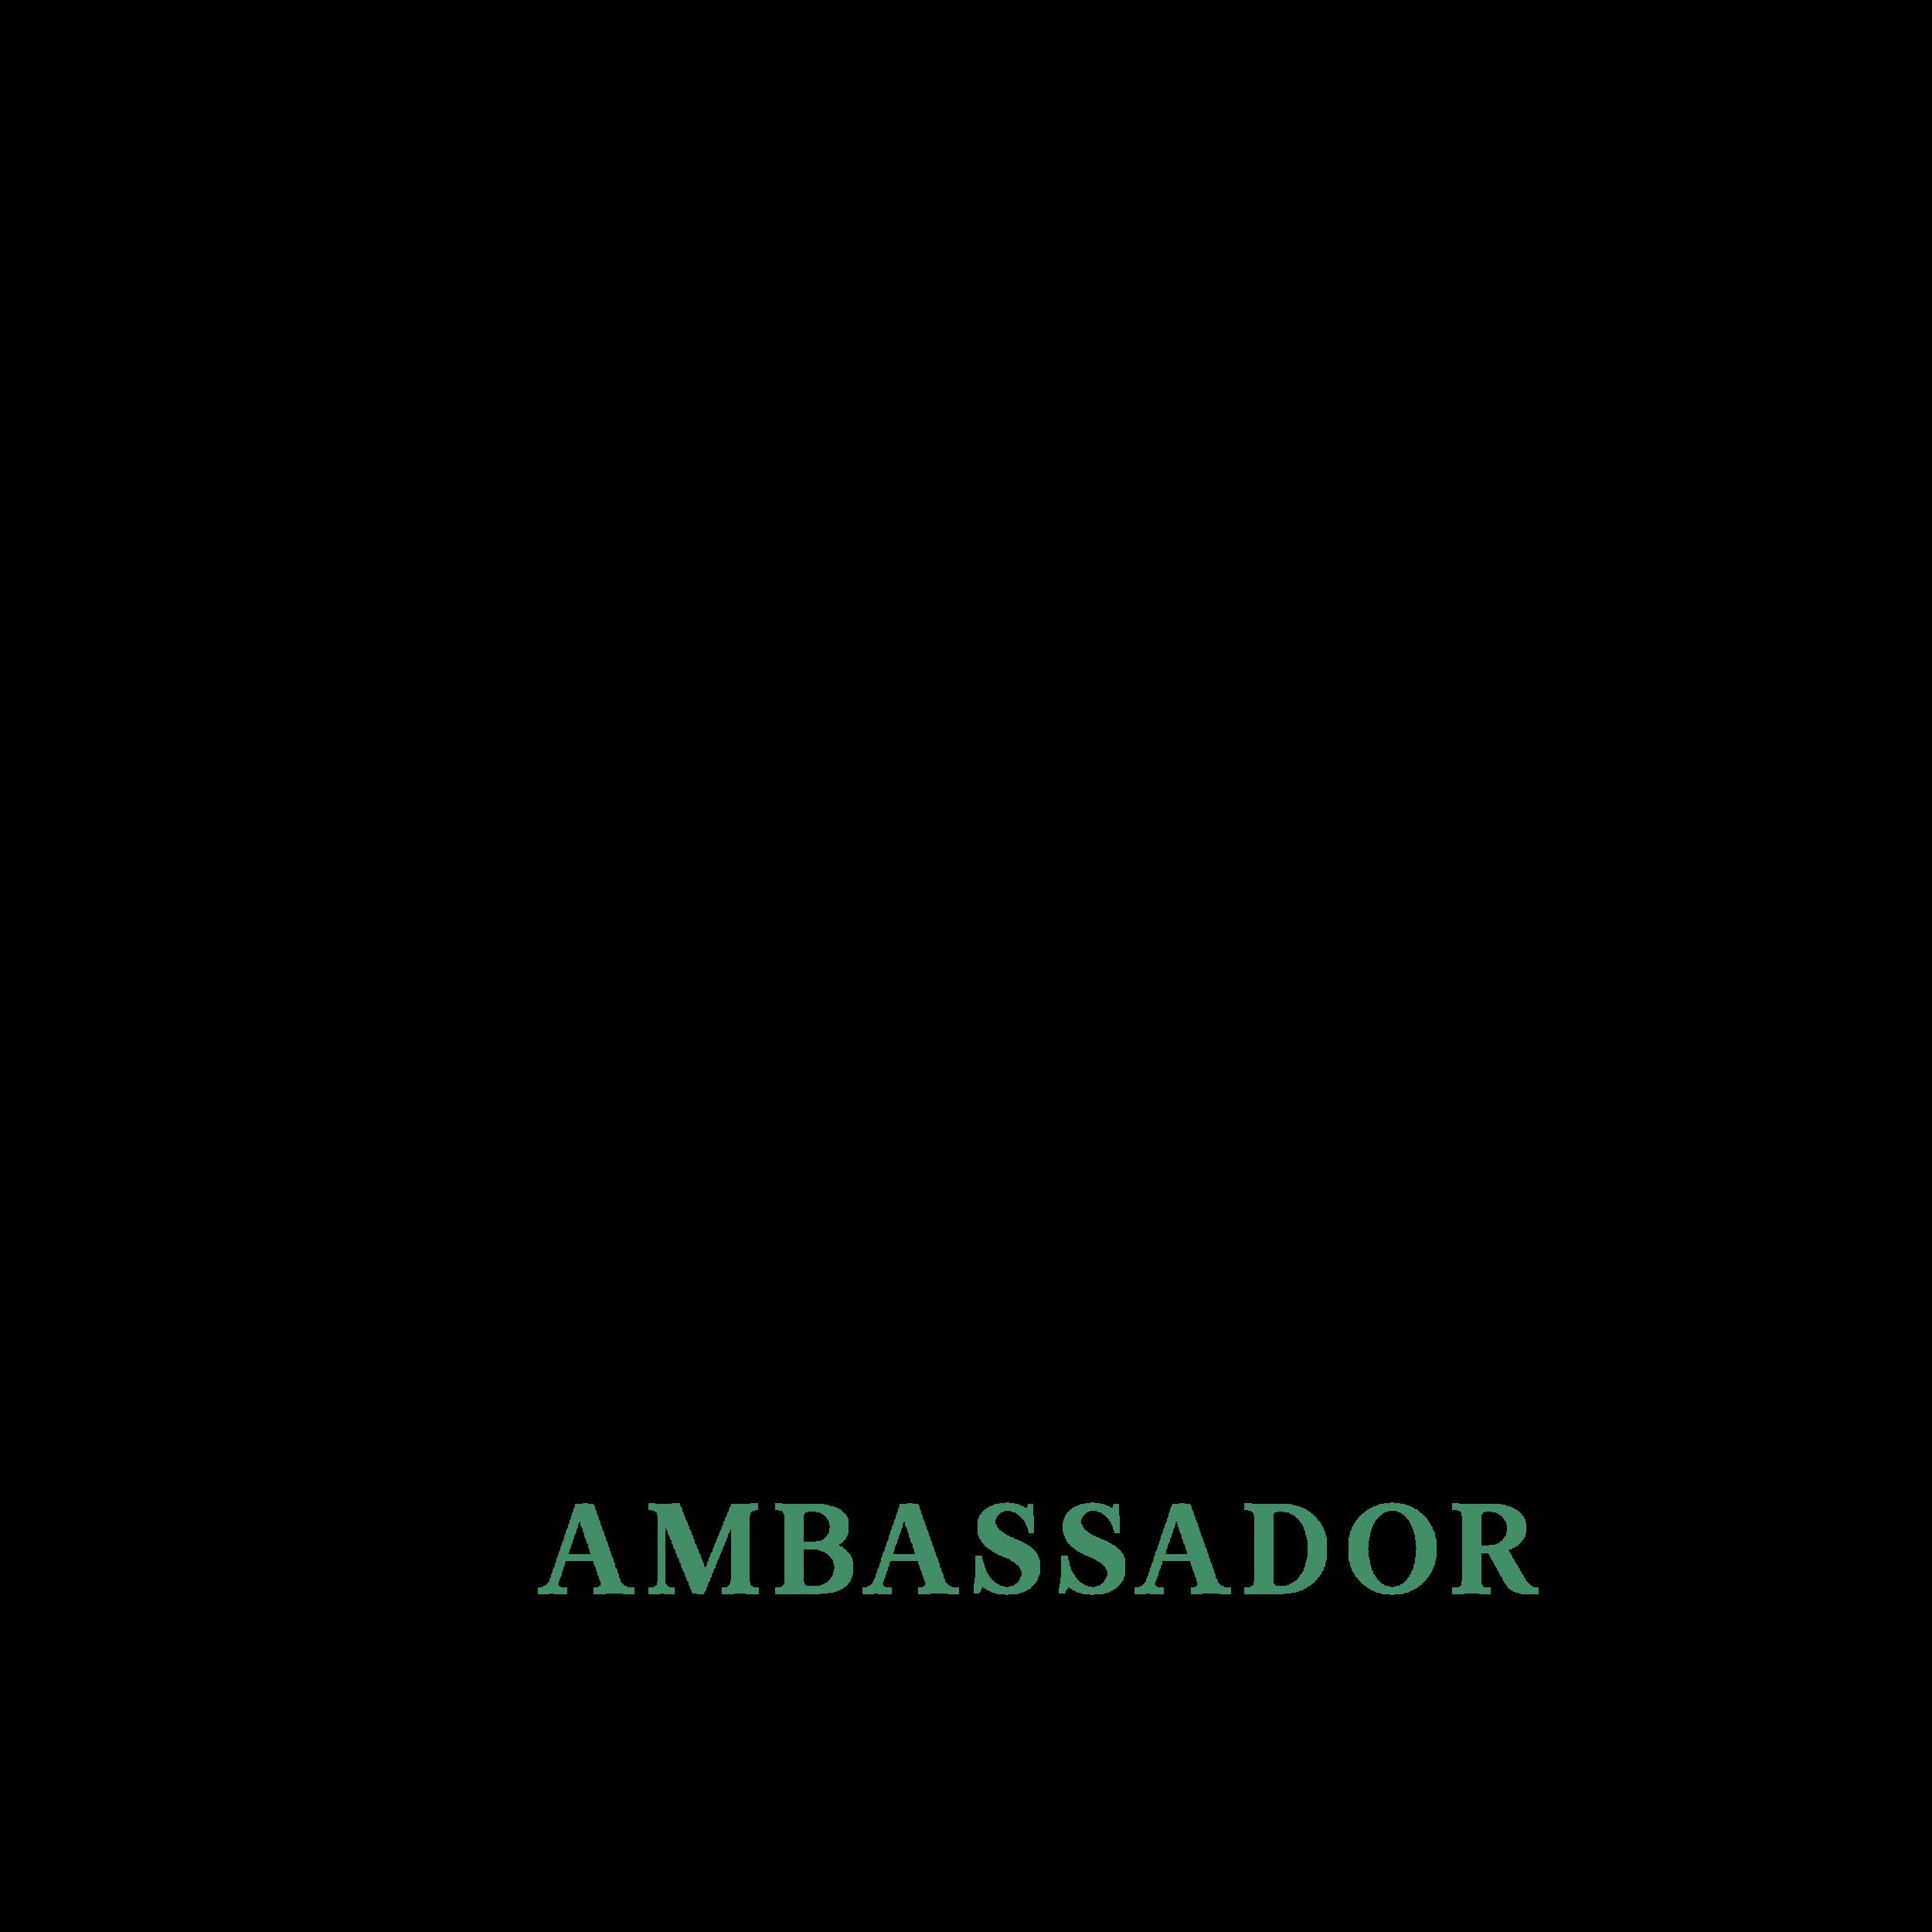 OprahDaily_Ambassadors_O Green.png